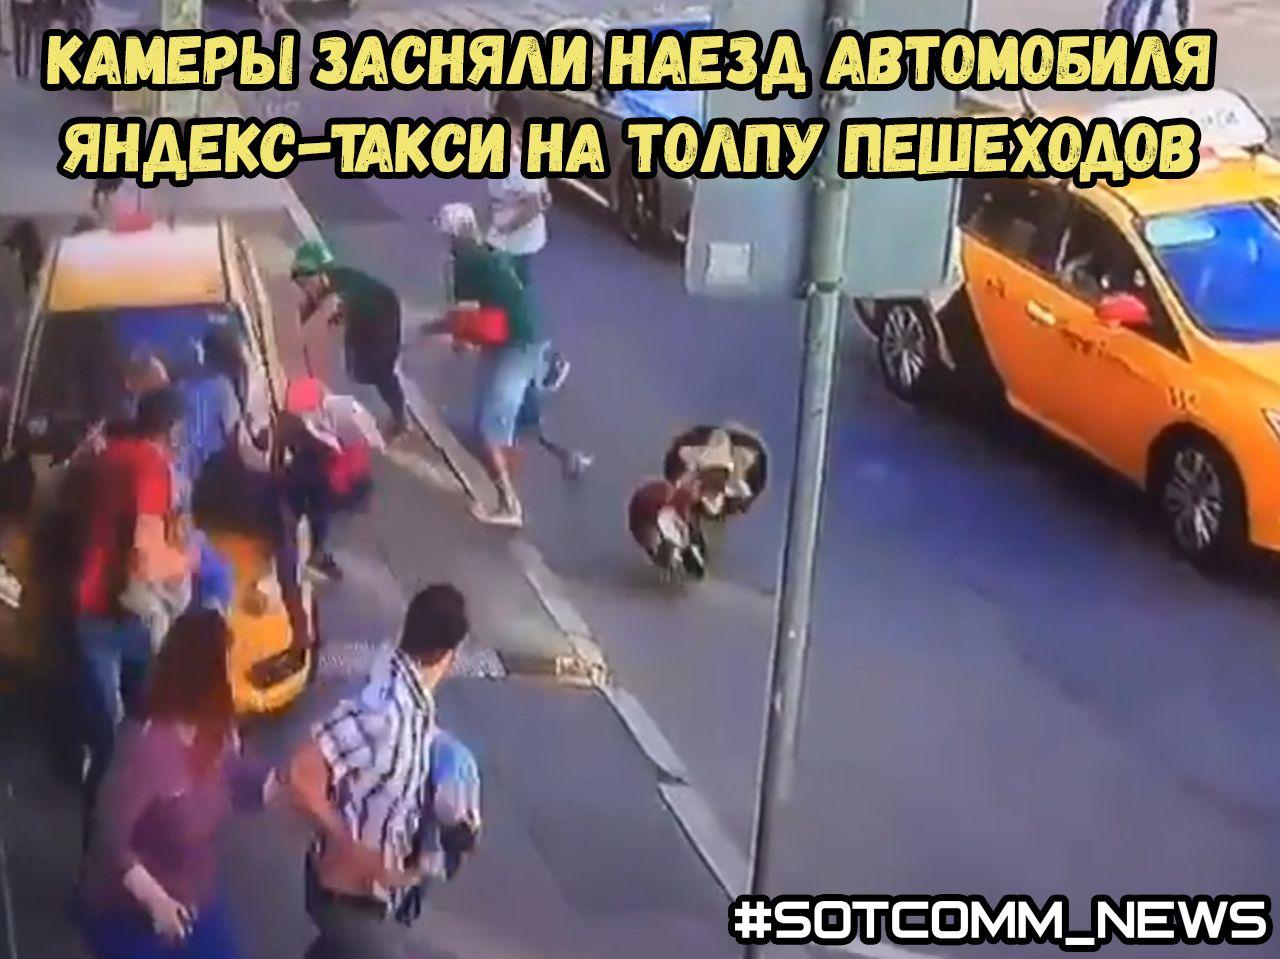 Камеры засняли наезд автомобиля Яндекс-такси на толпу пешеходов